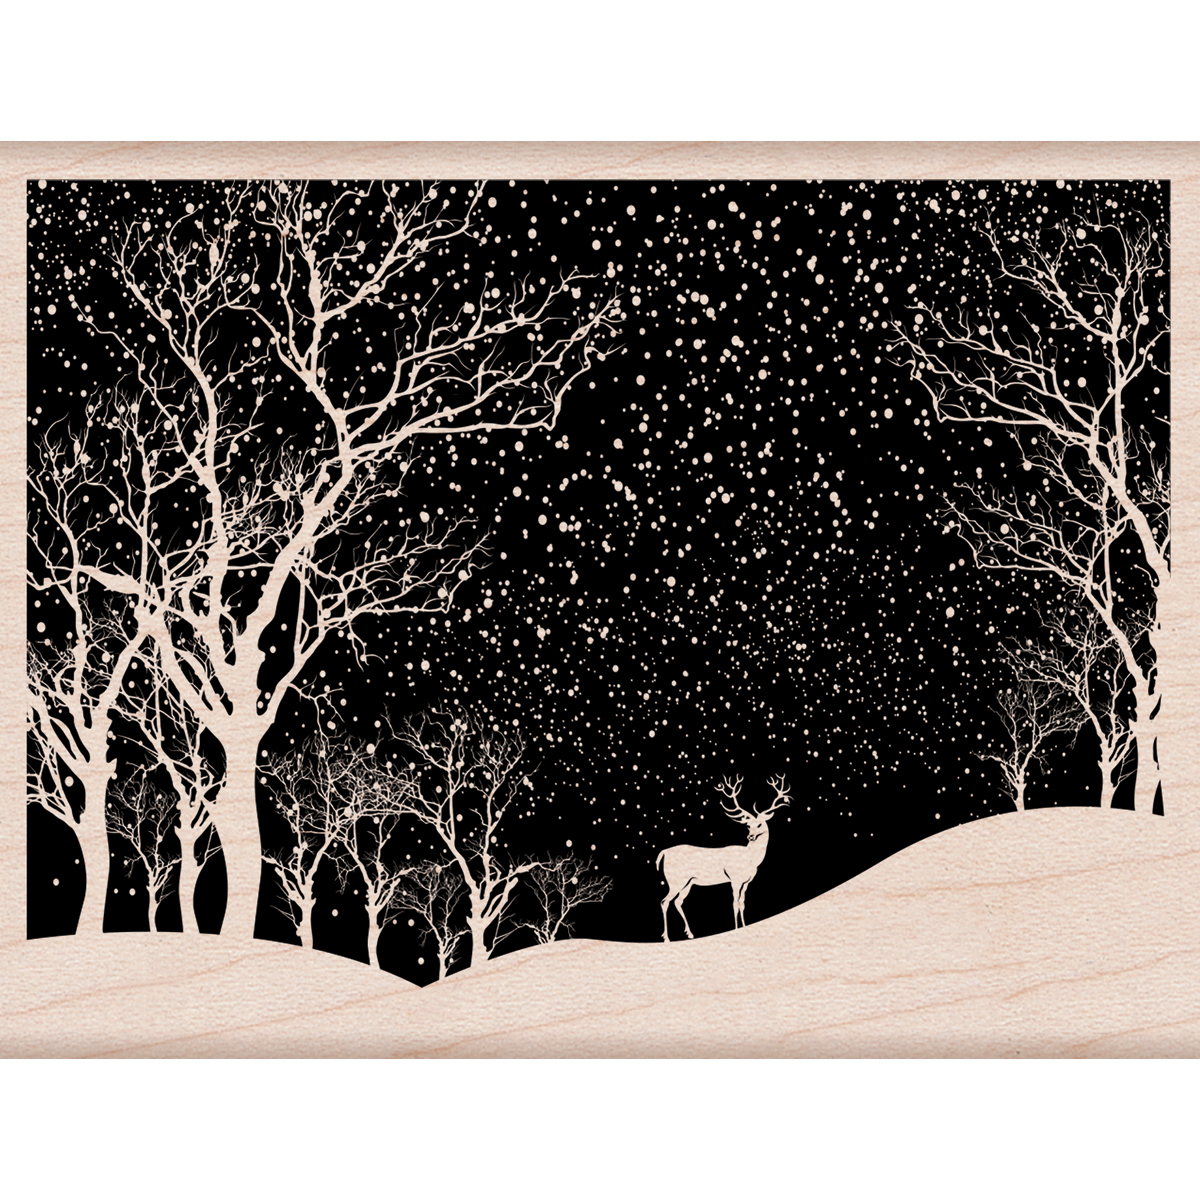 Hero Arts Mounted Rubber Stamp 4.25X3.25-Snowy Scene